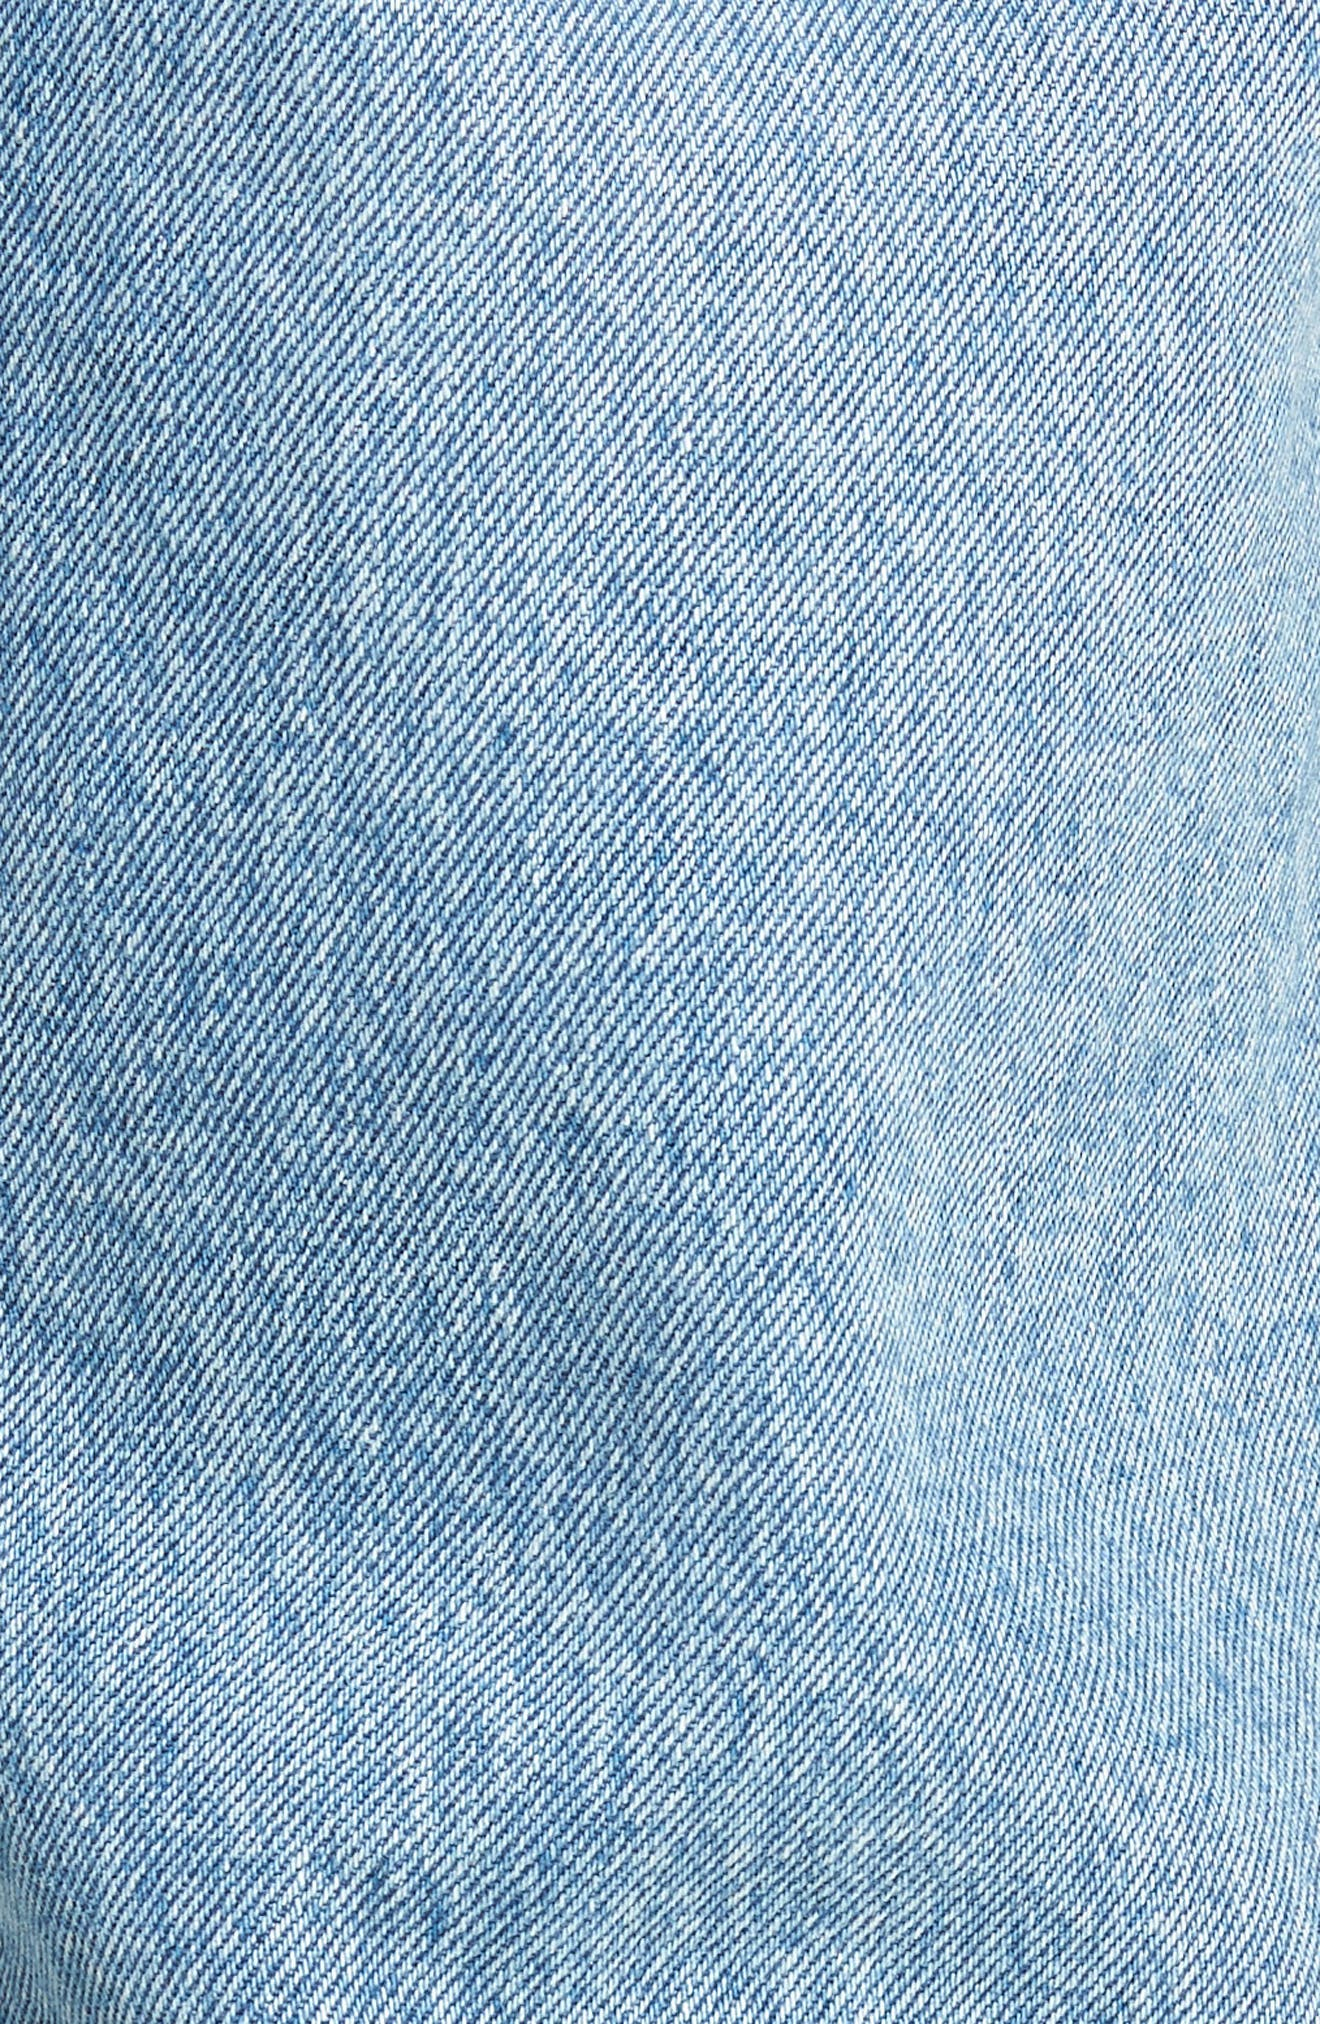 Mharky Slim Straight Leg Jeans,                             Alternate thumbnail 5, color,                             0076M